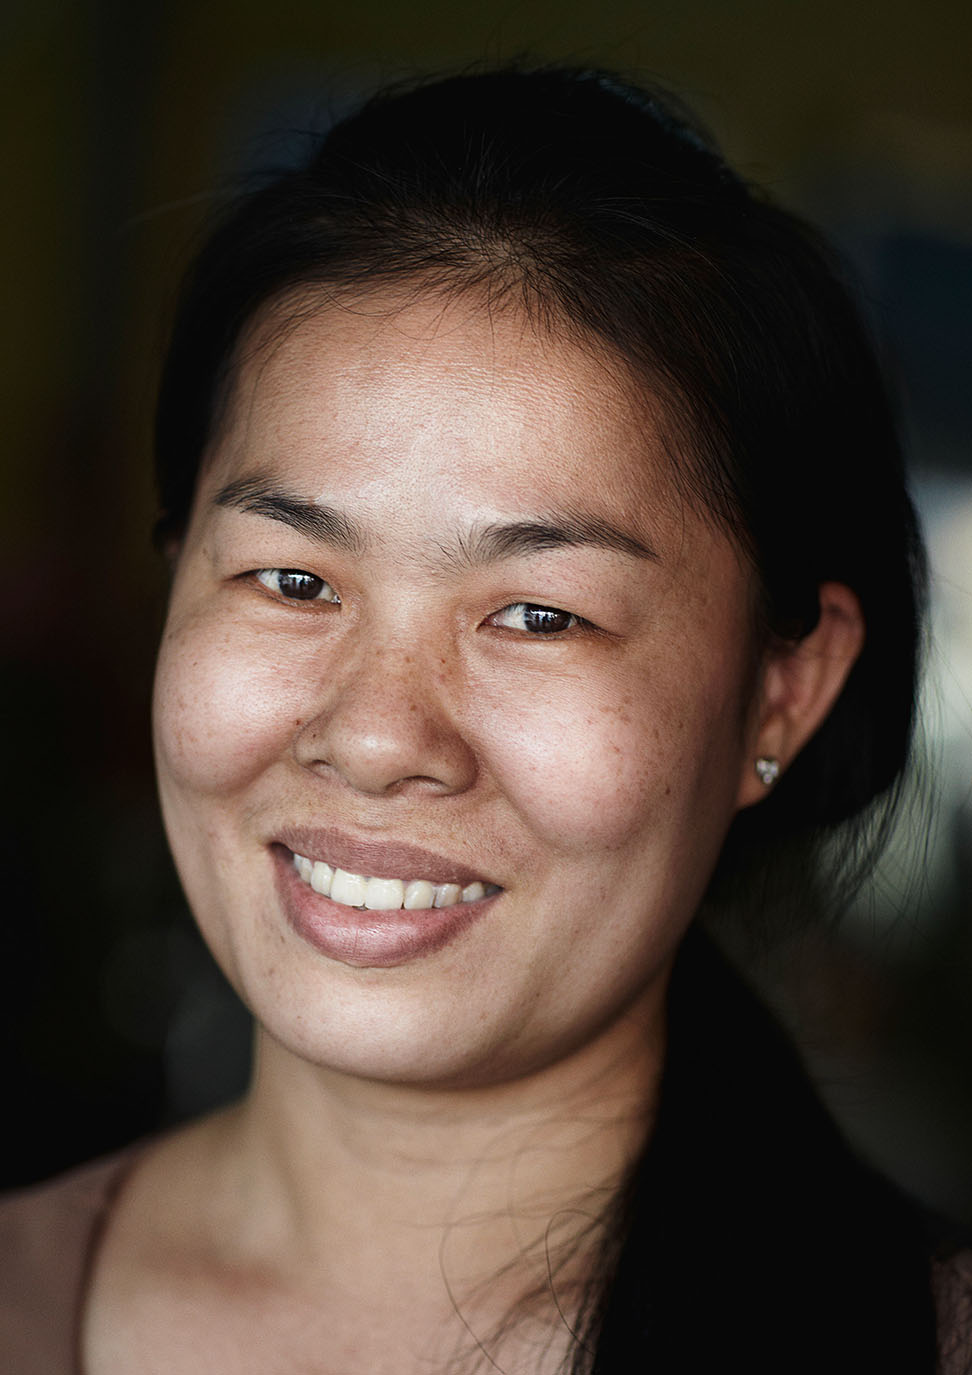 Portrait_Phnom Penh_08.jpg